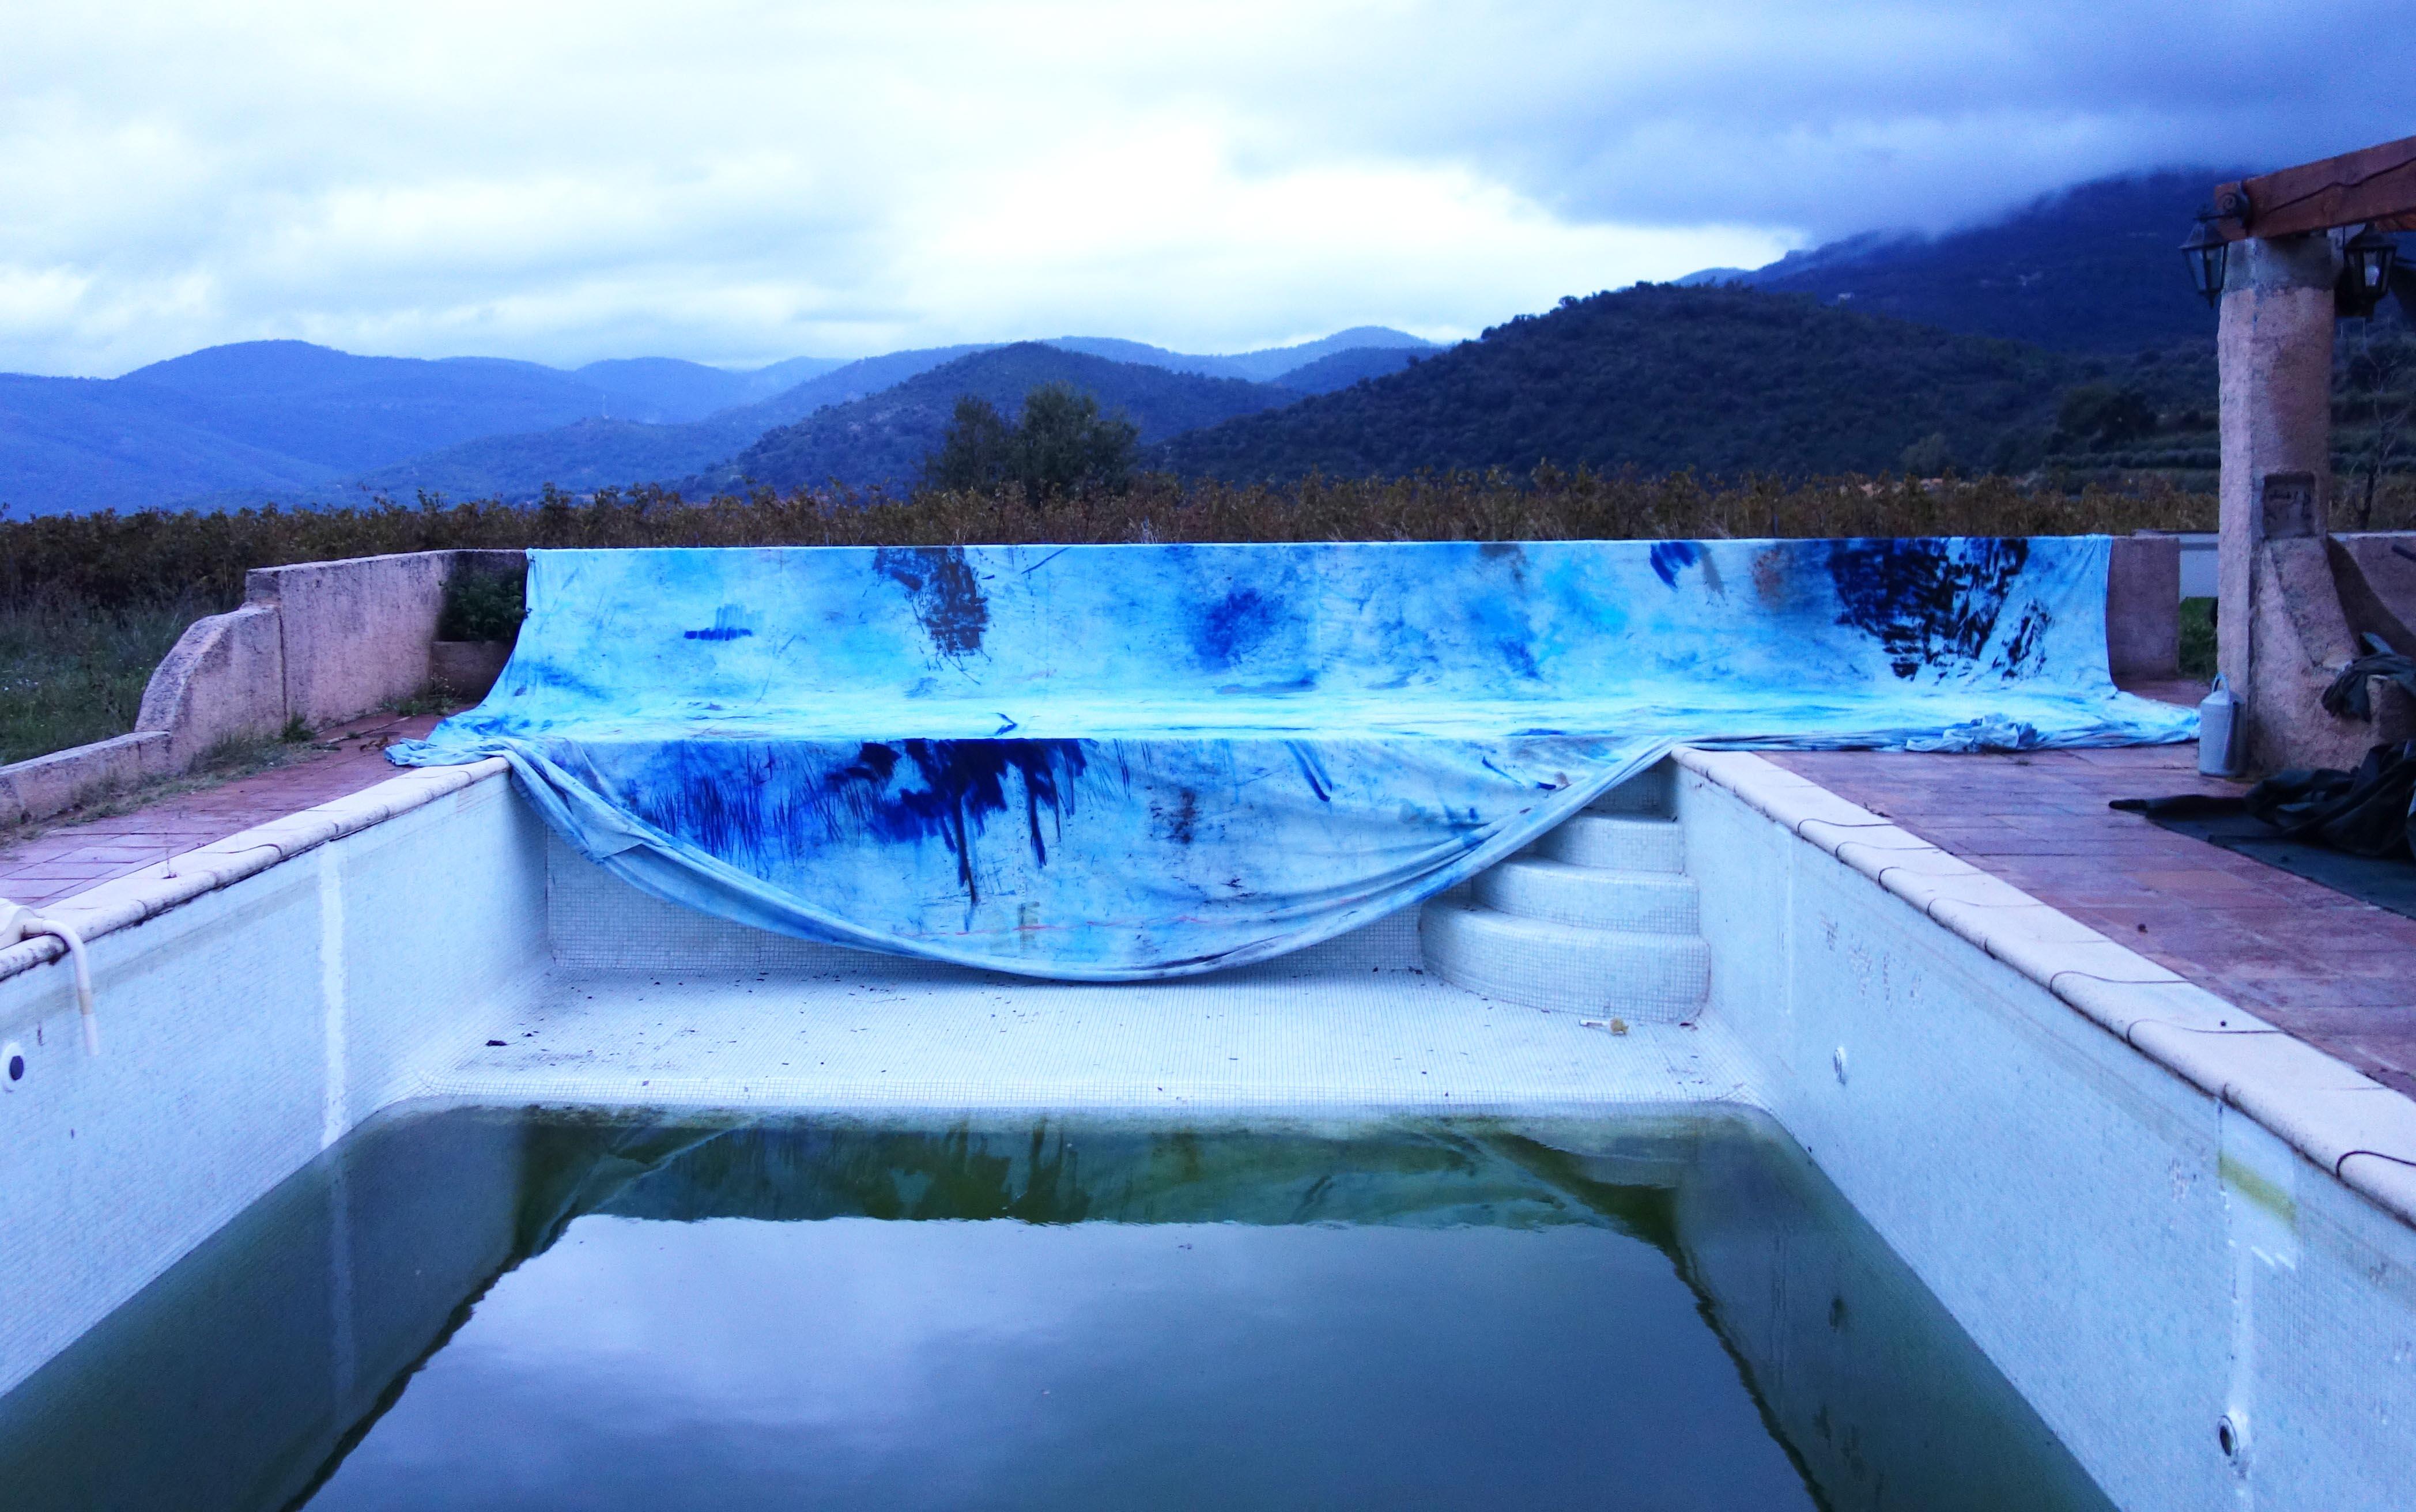 emmanuelle rosso artiste visual art blue theater project troupe erratum